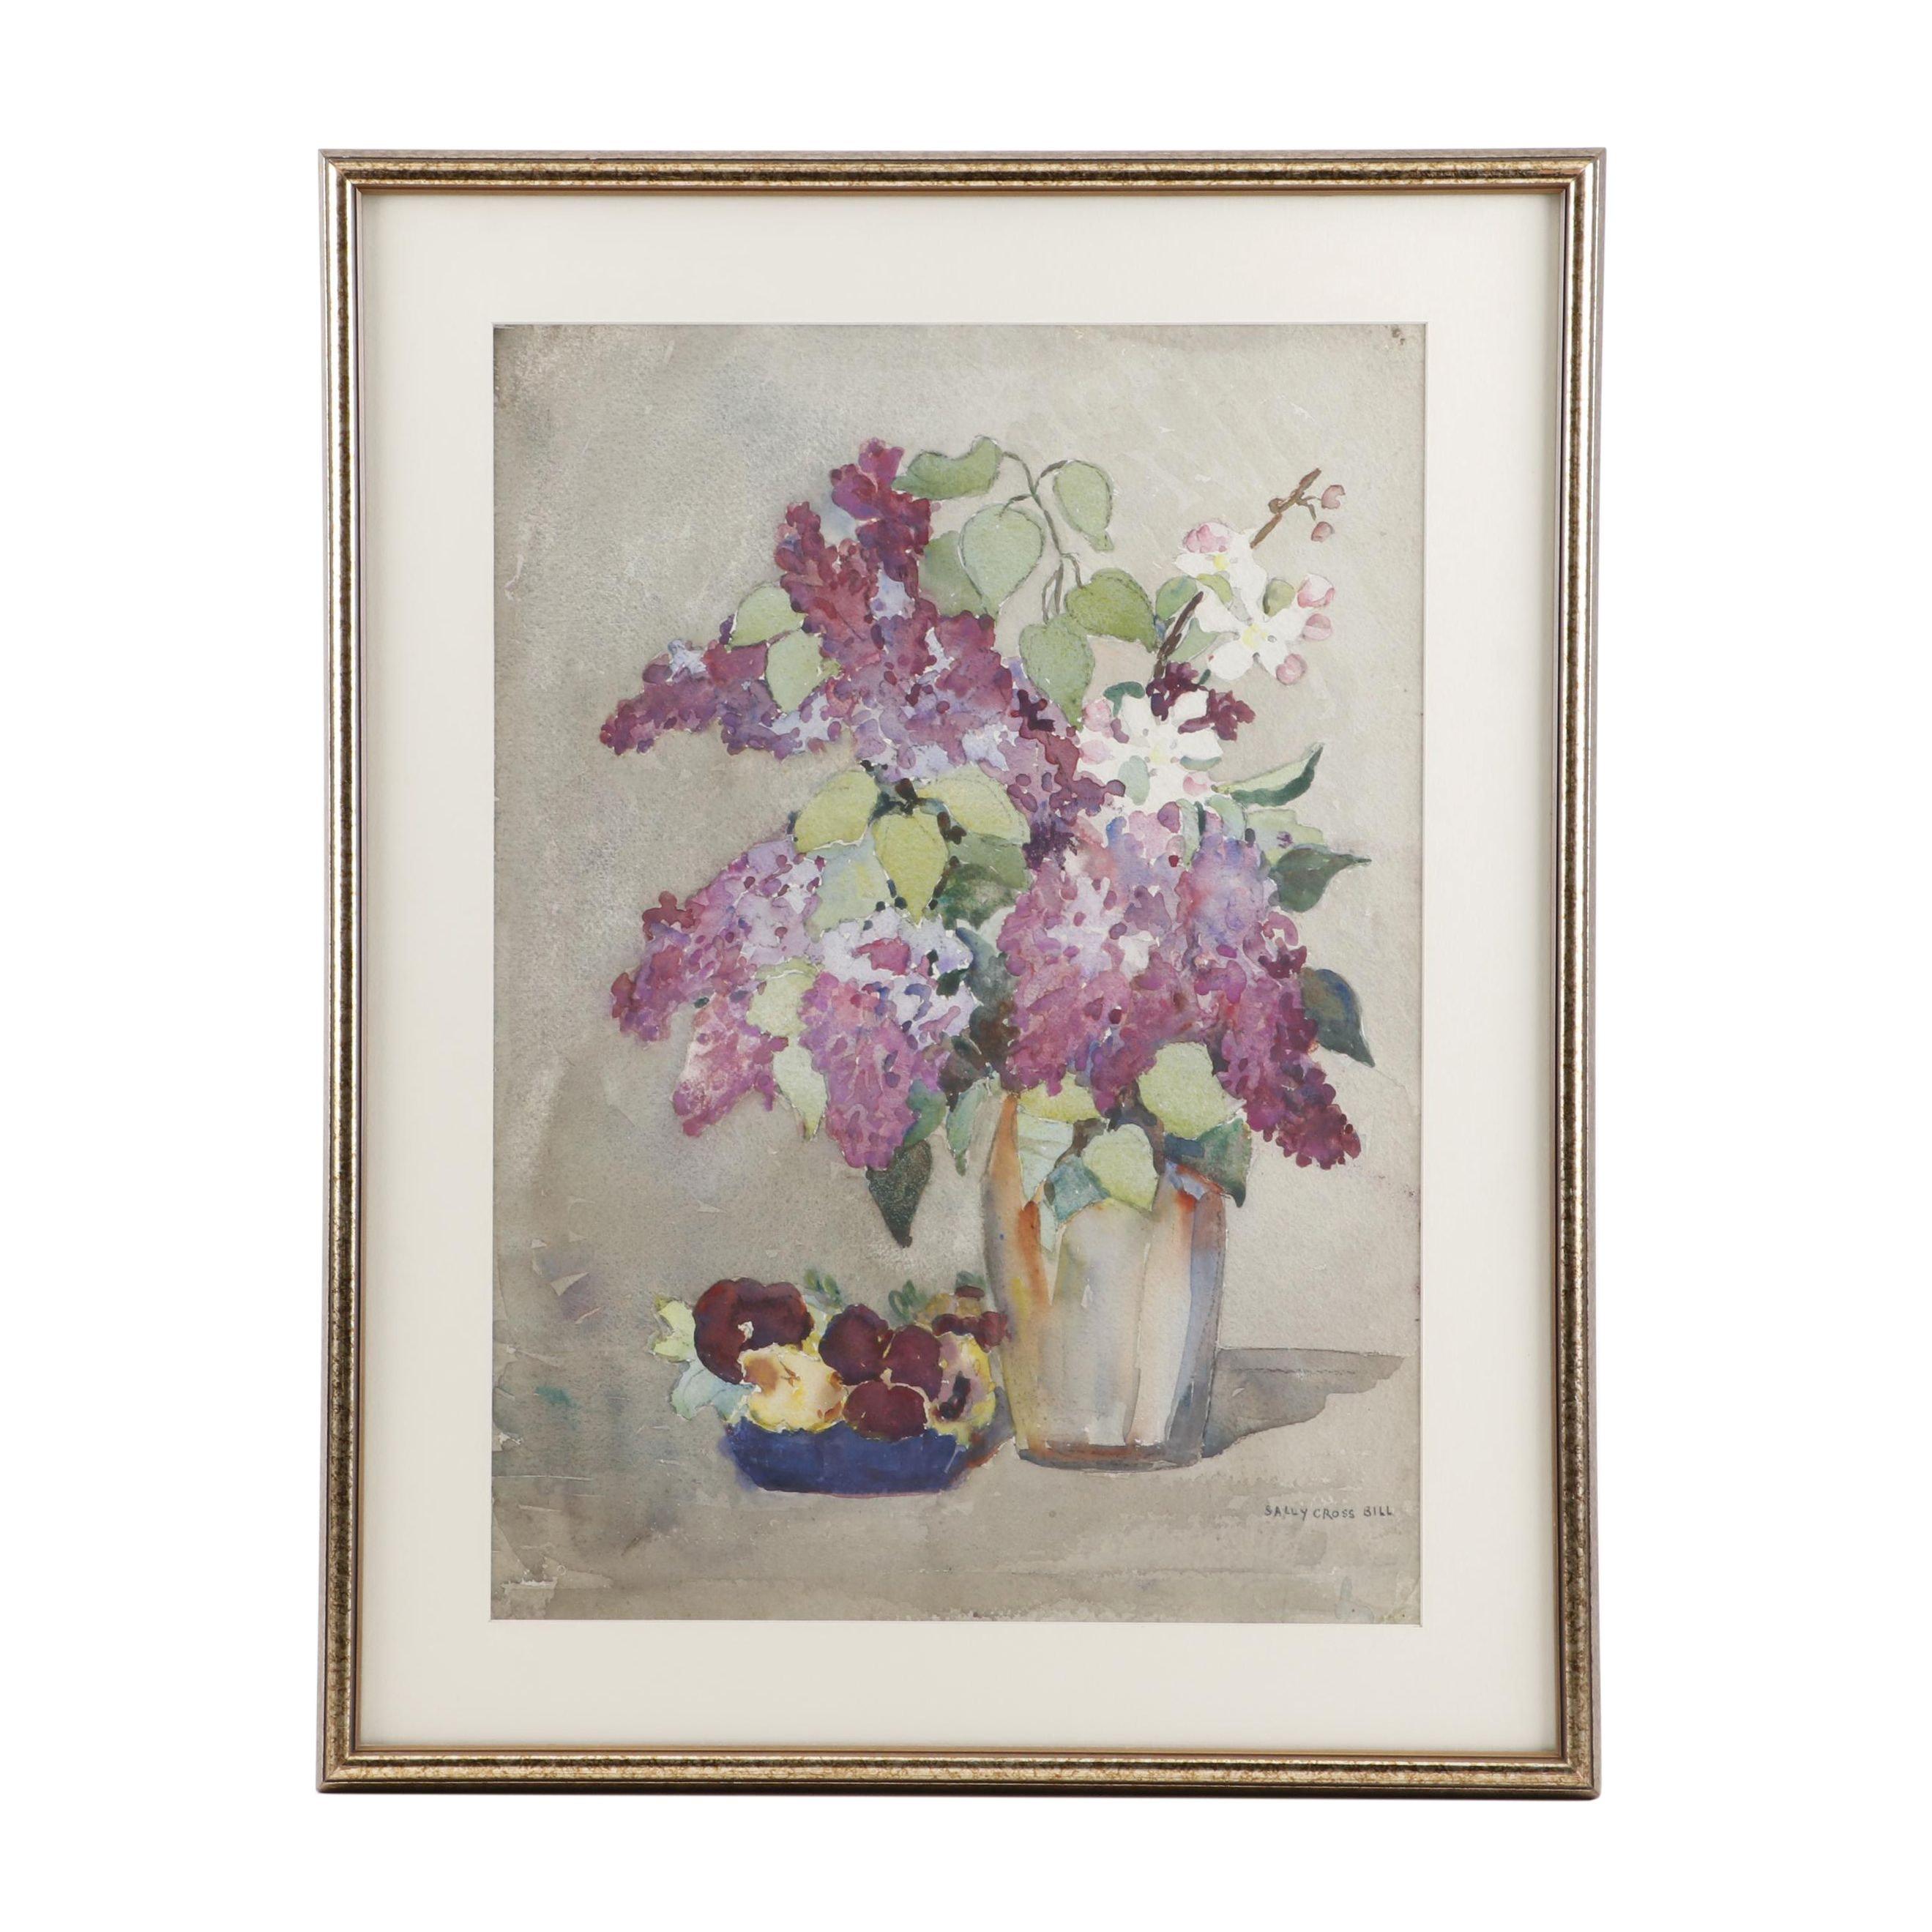 Sally Cross Bill Floral Still Life Watercolor Painting